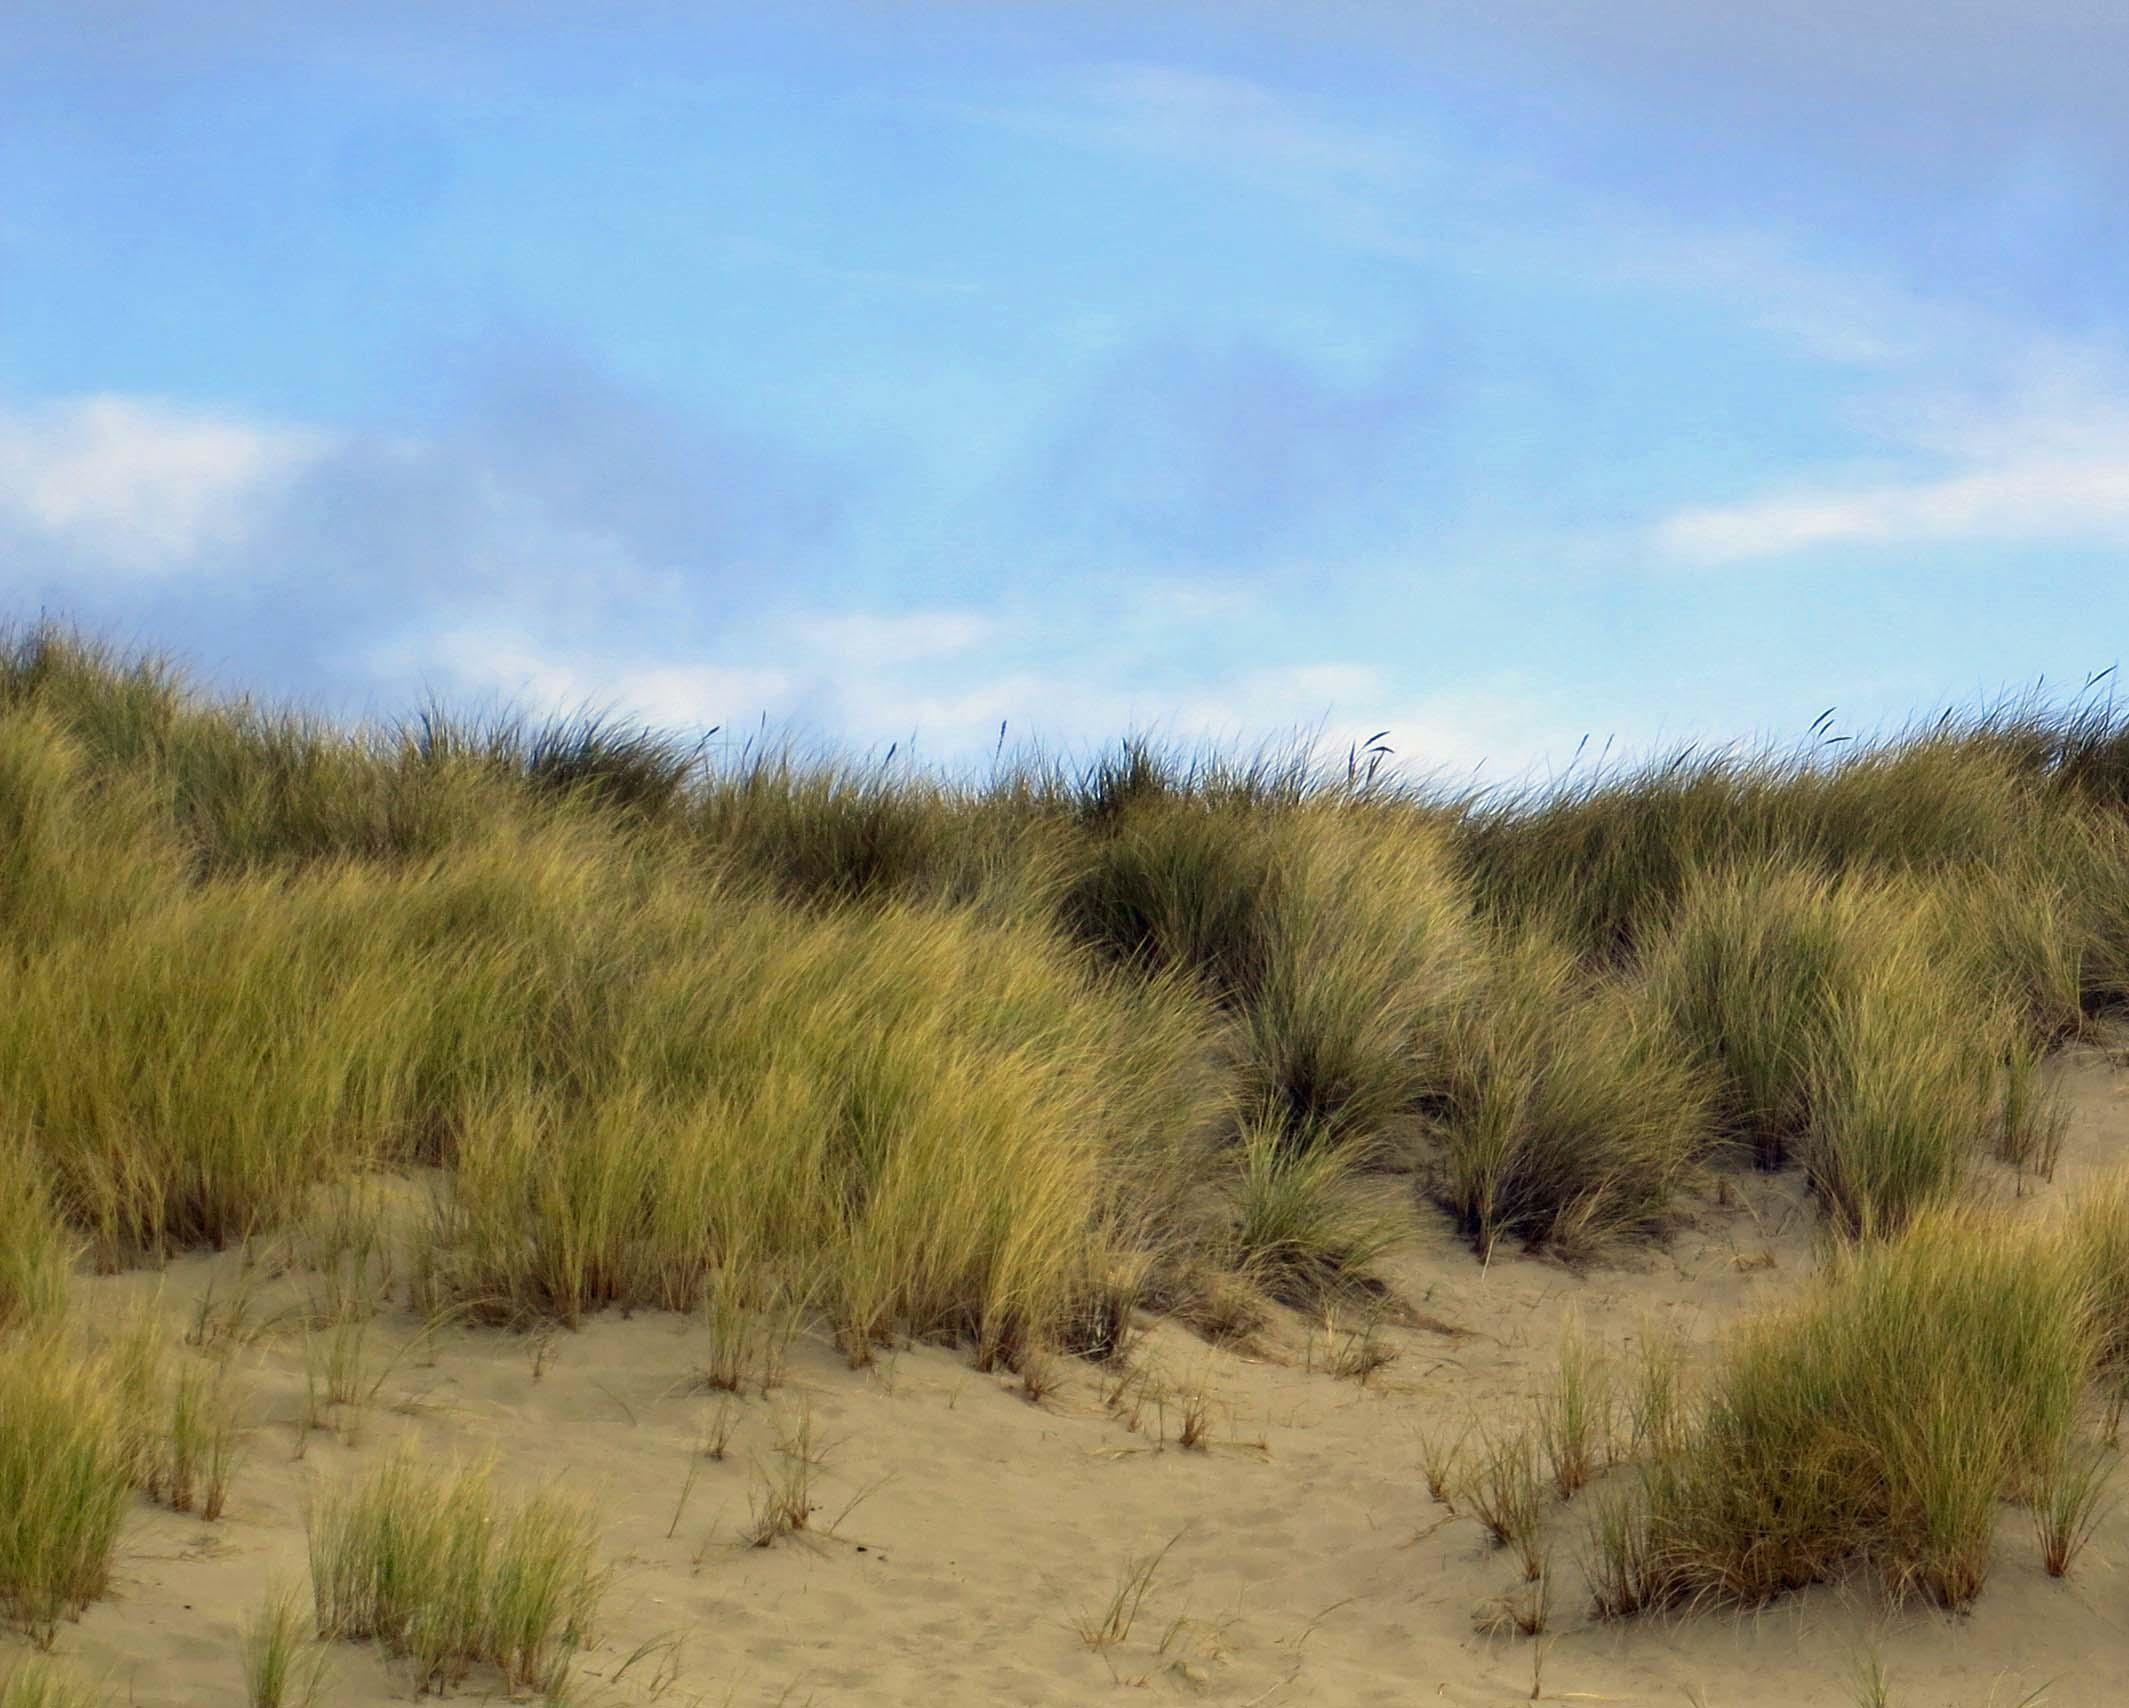 Photo of grass on Limantour Spit taken by Curtis Mekemson.